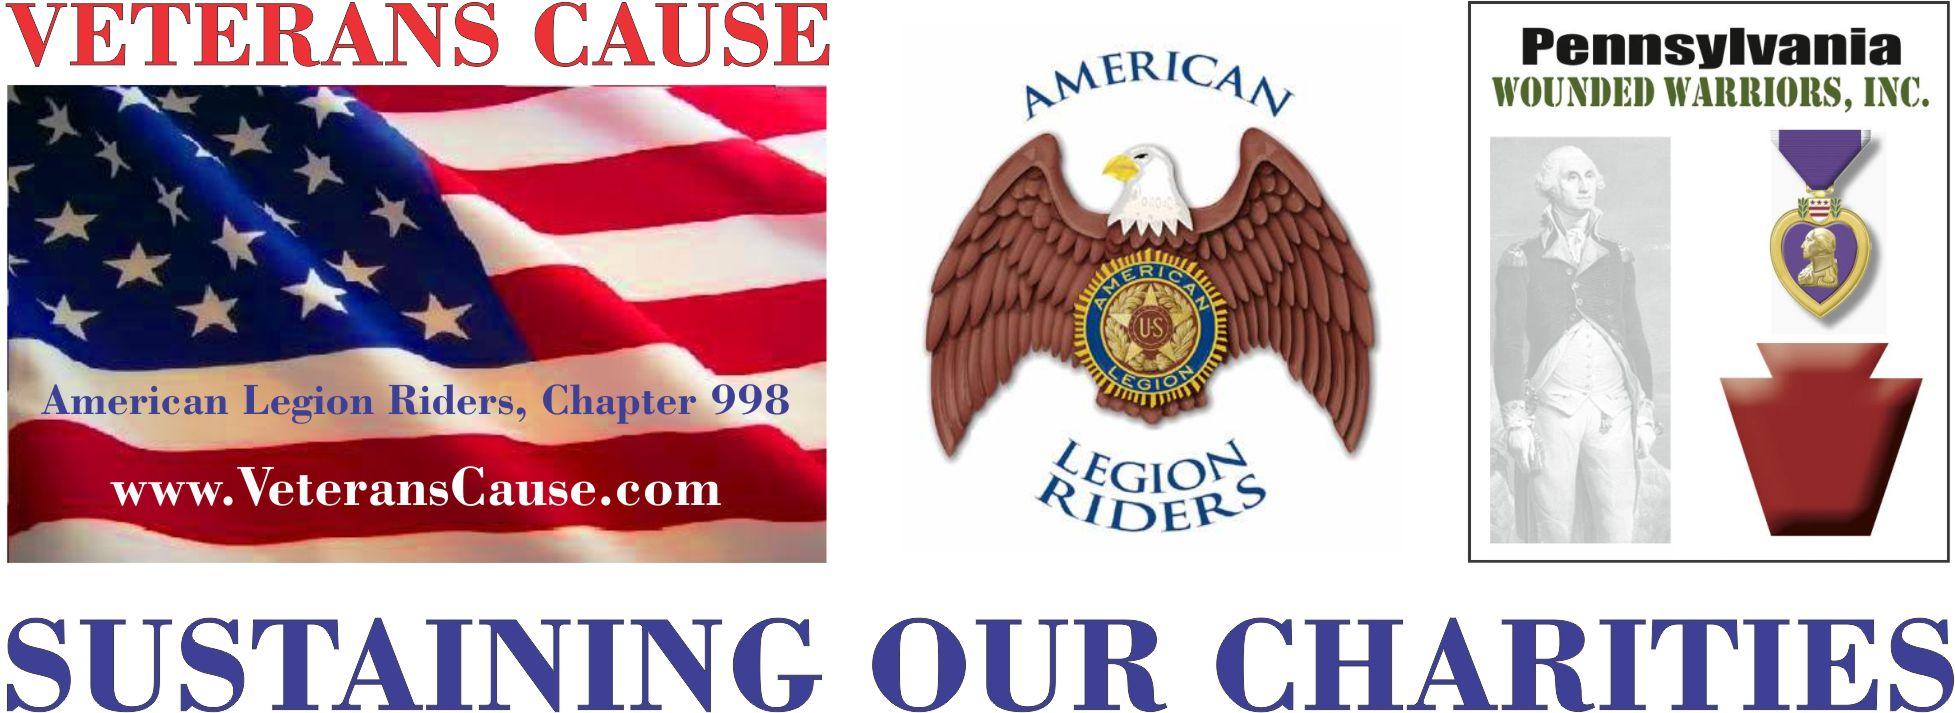 American Legion Riders, Chapter 998, Harrisburg, PA 17111